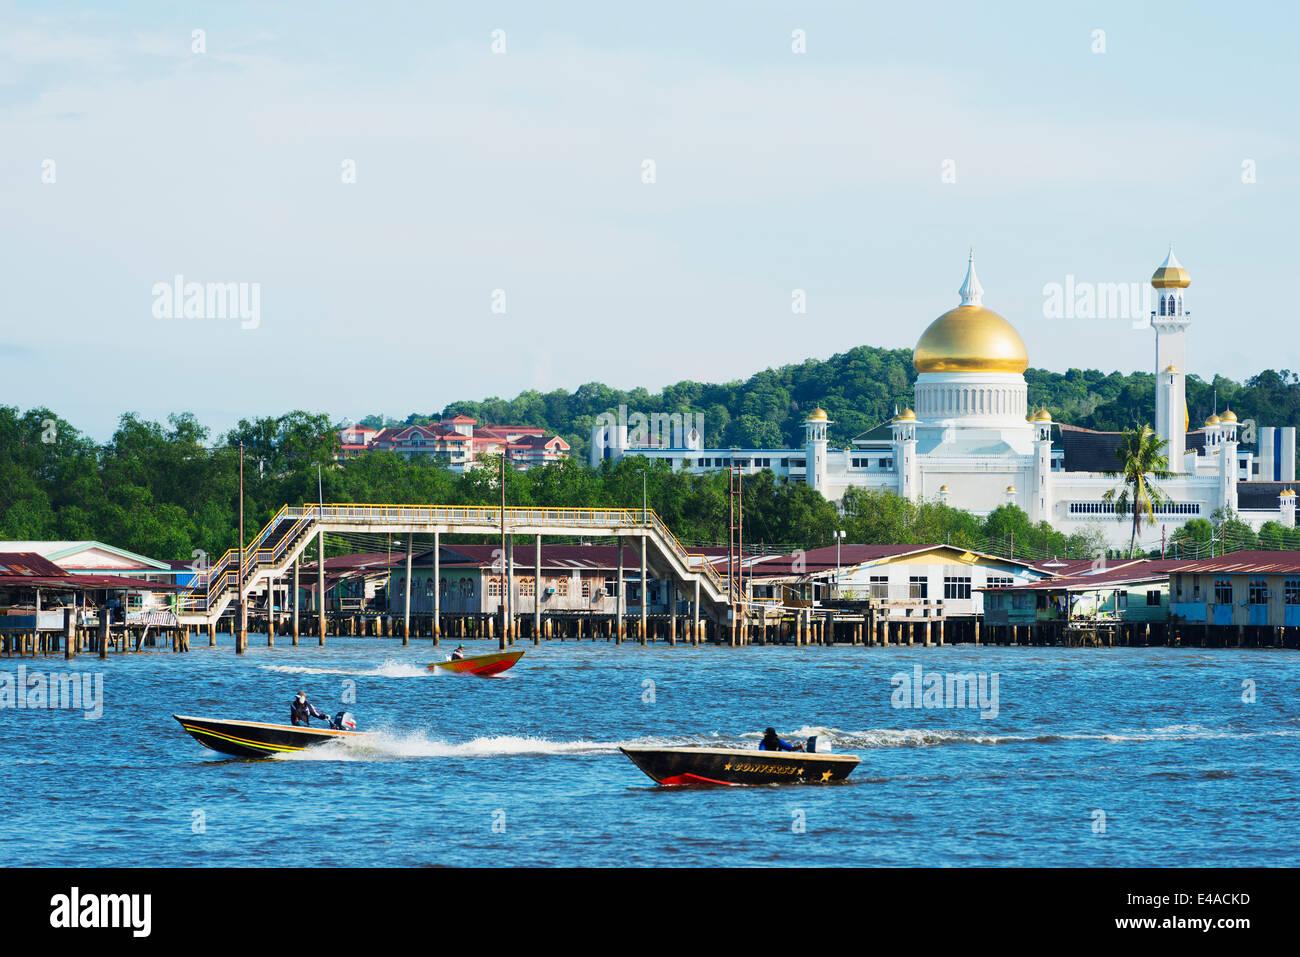 South East Asia, Kingdom of Brunei, Bandar Seri Begawan, Omar Ali Saifuddien Mosque - Stock Image